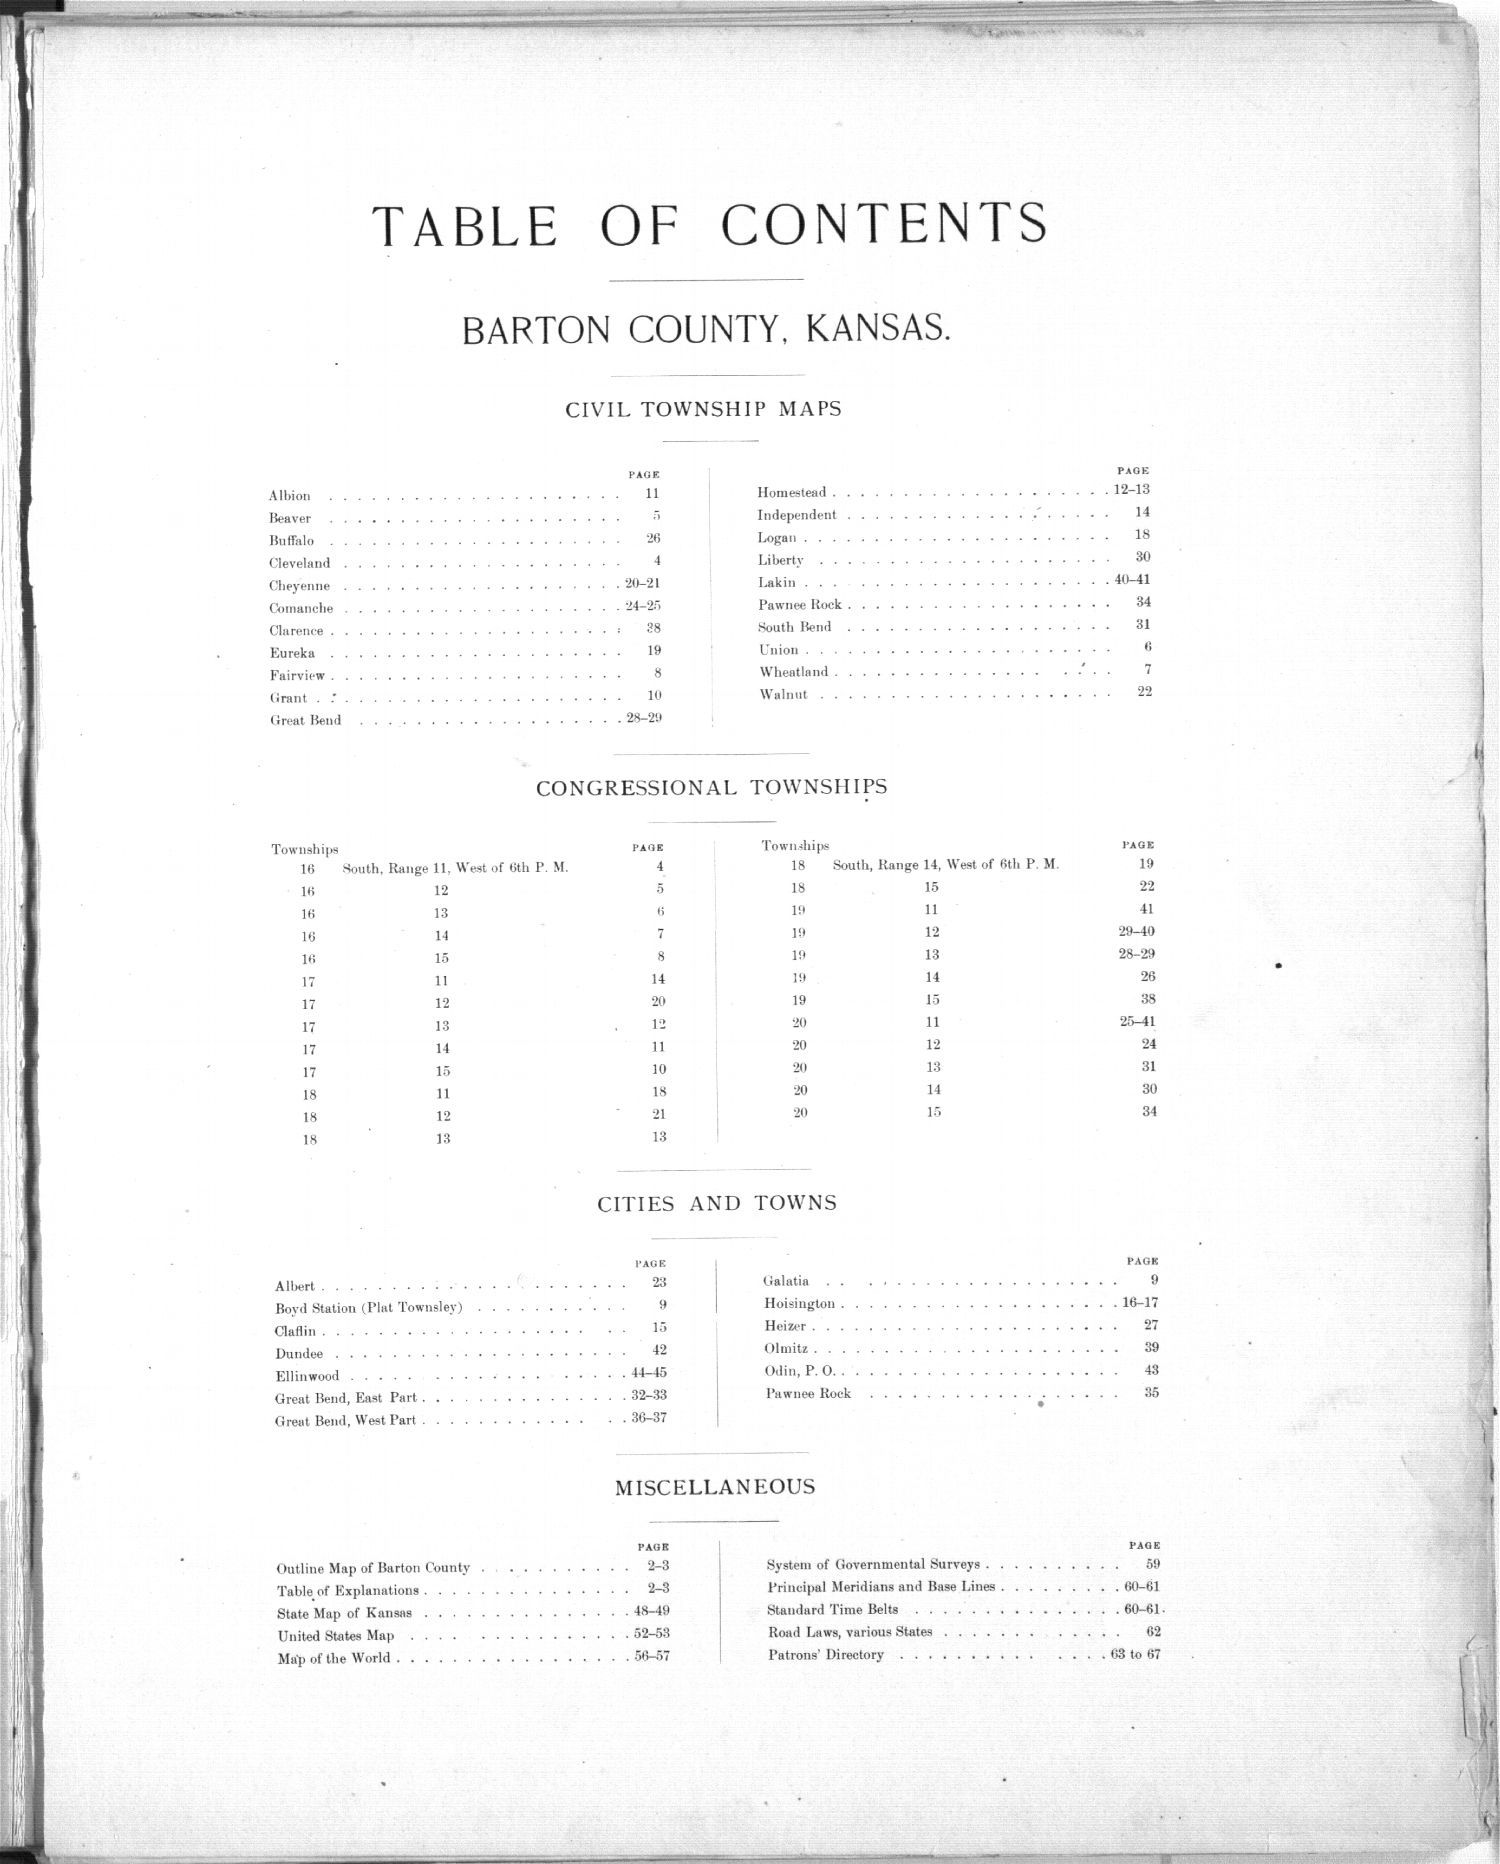 Plat book, Barton County, Kansas - Table of Contents